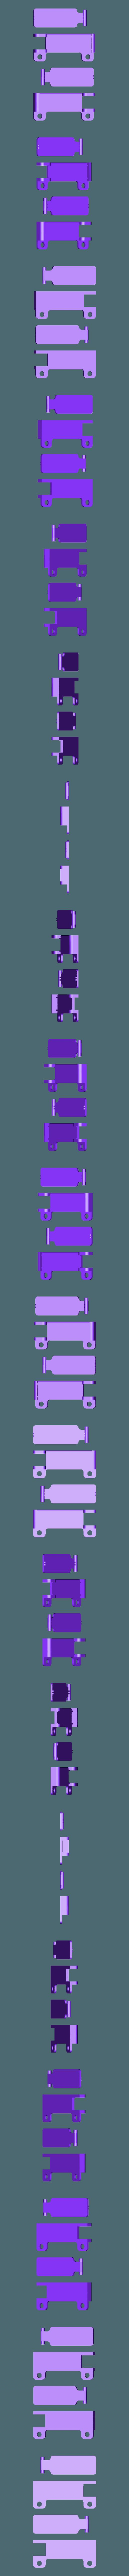 tapa_boca_juntos.stl Download free STL file Homemade Chinstrap Clip for Covid-19 Corona Virus • 3D print template, ELREYSALE